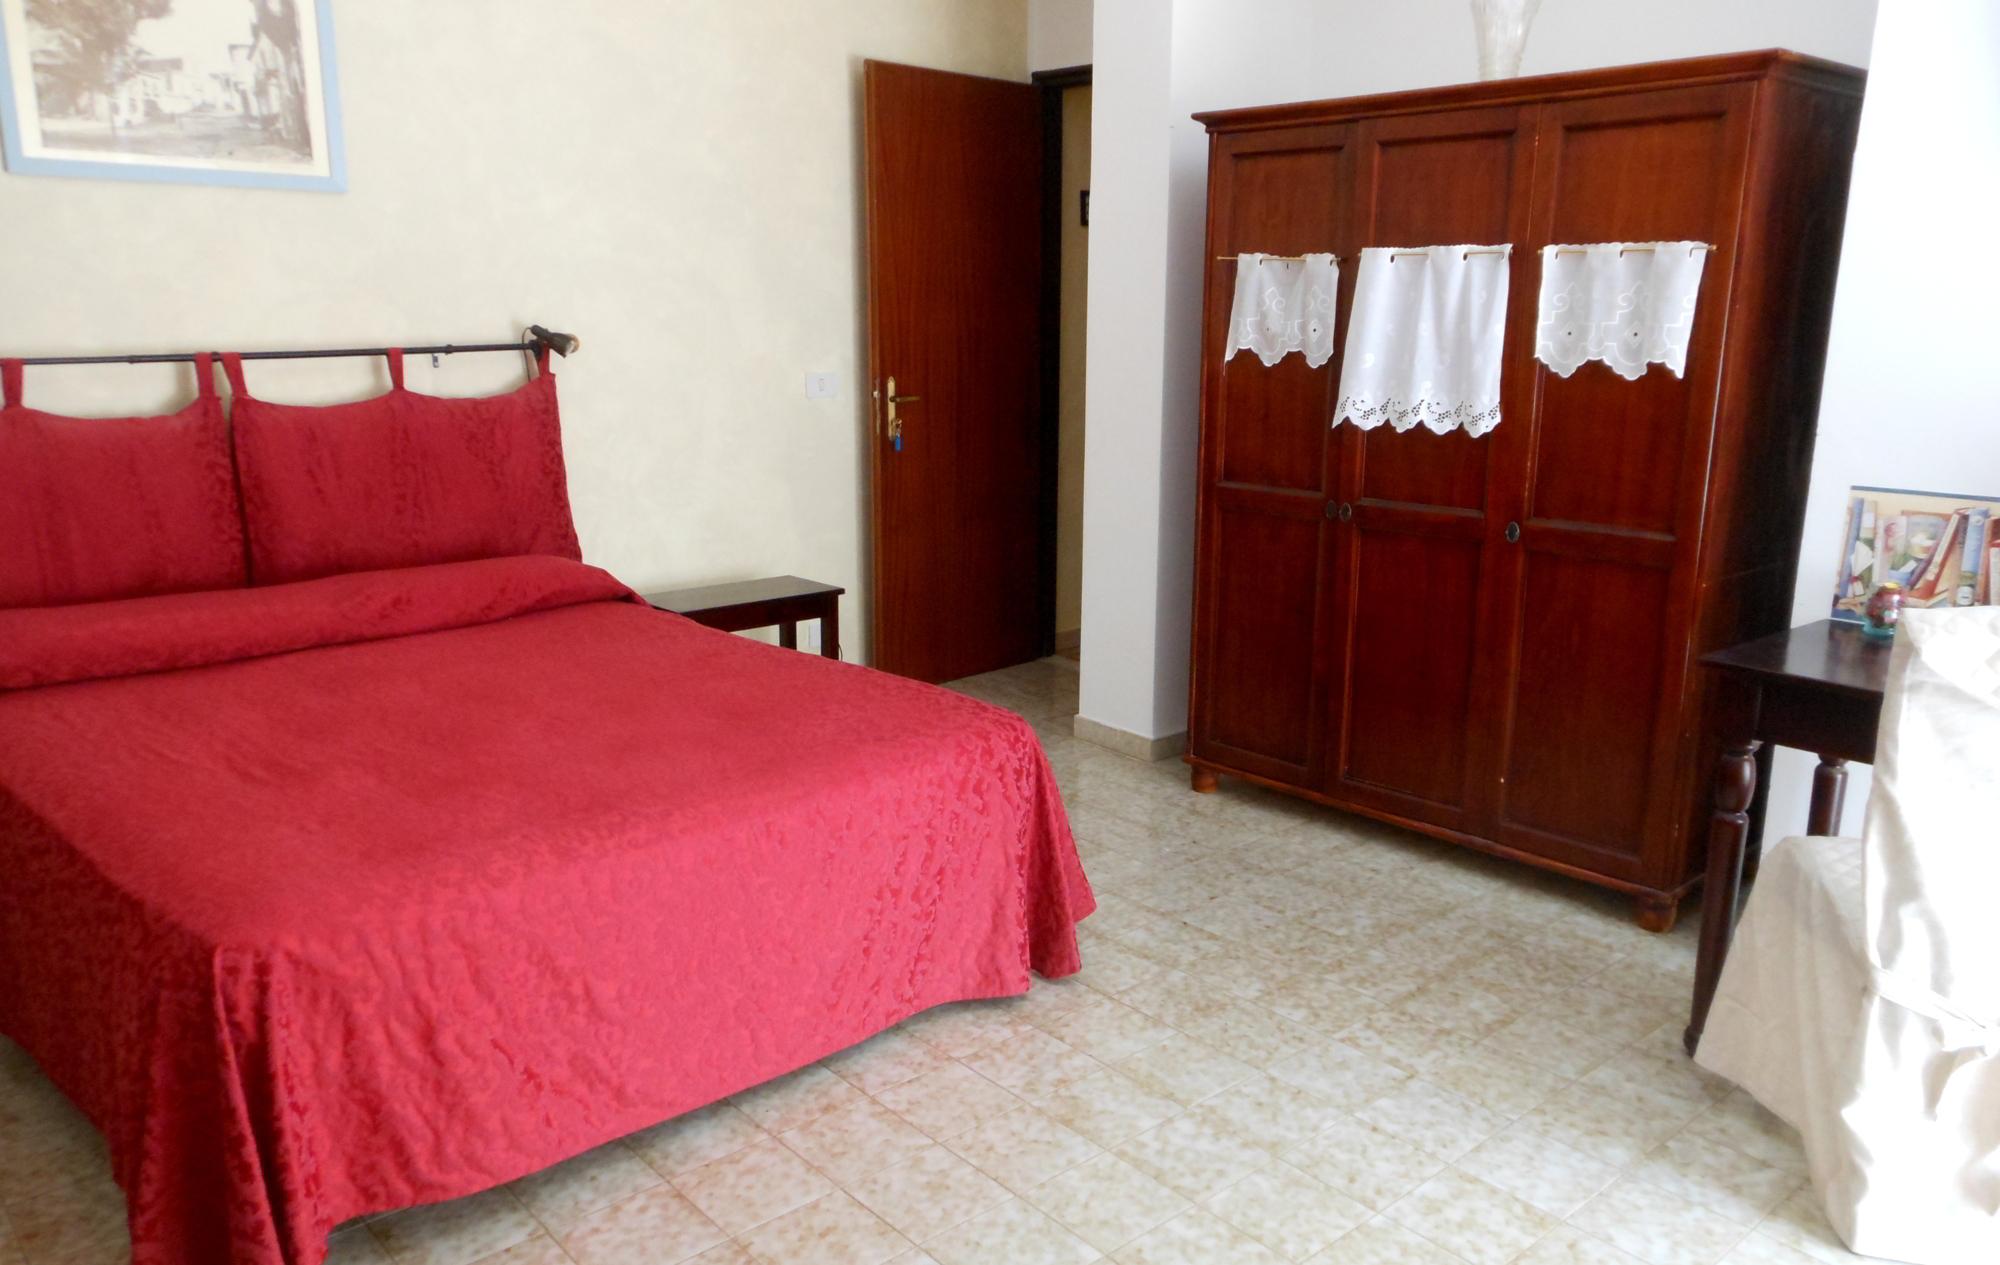 vacances in sicile al palmento b b galati mamertino bed and breakfast. Black Bedroom Furniture Sets. Home Design Ideas